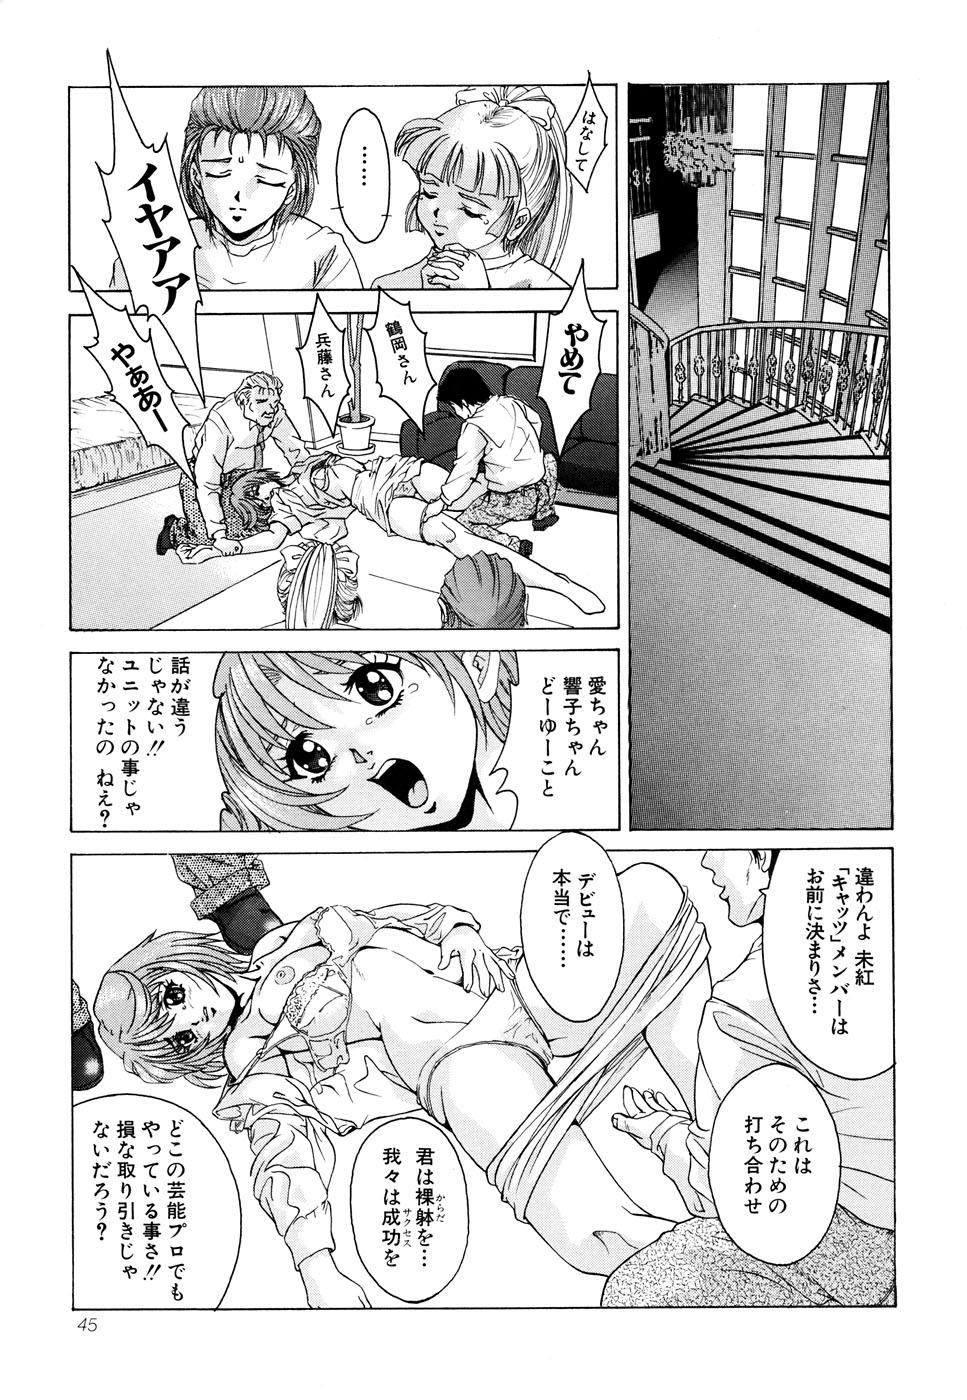 G-drive Vol.1 Ryoujokuhen 44